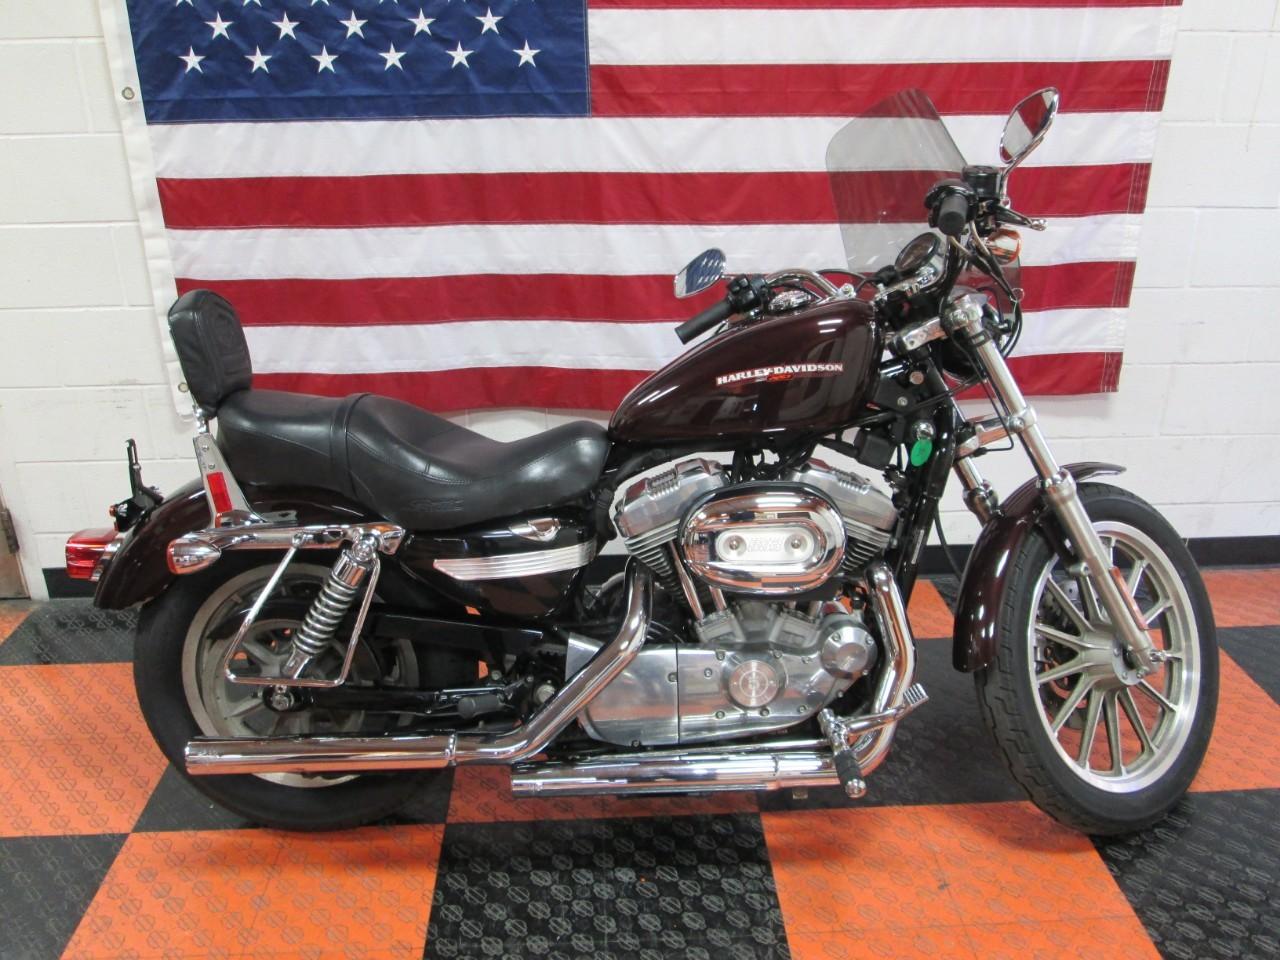 Texas - Sportster 883 Superlow For Sale - Harley-Davidson